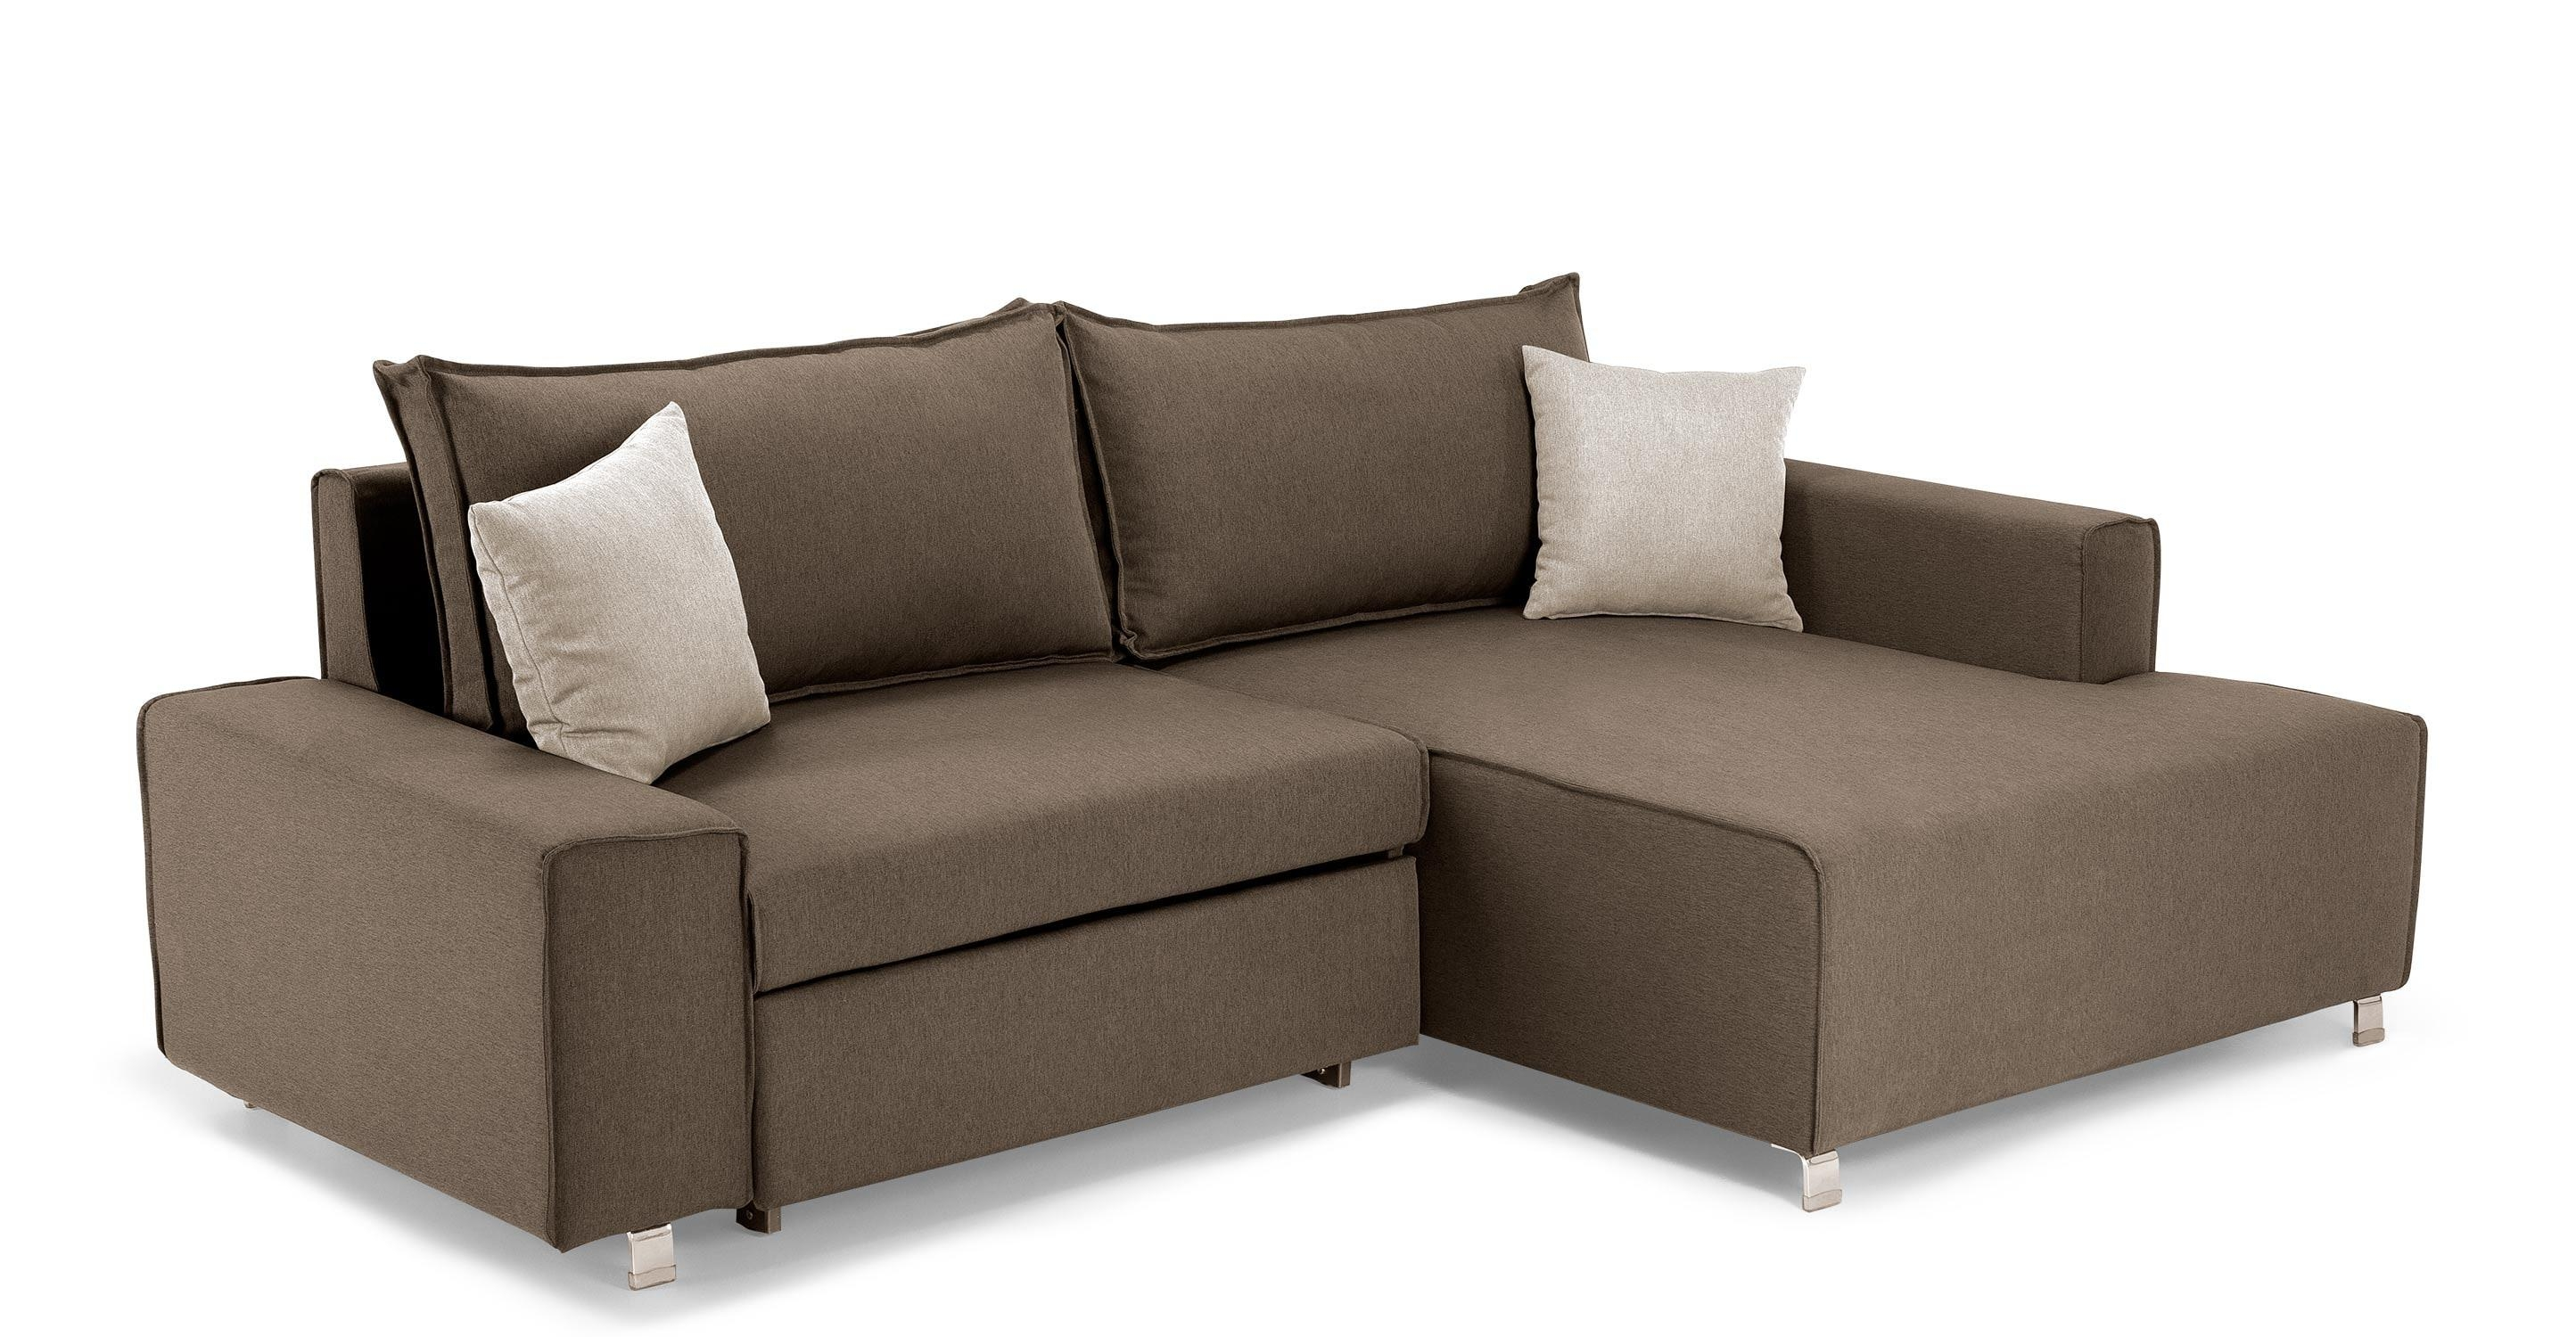 Sofas Center : Corner Sofa Beds Uk Cheap Birminghamcorner For Throughout Cheap Corner Sofa (Image 18 of 20)